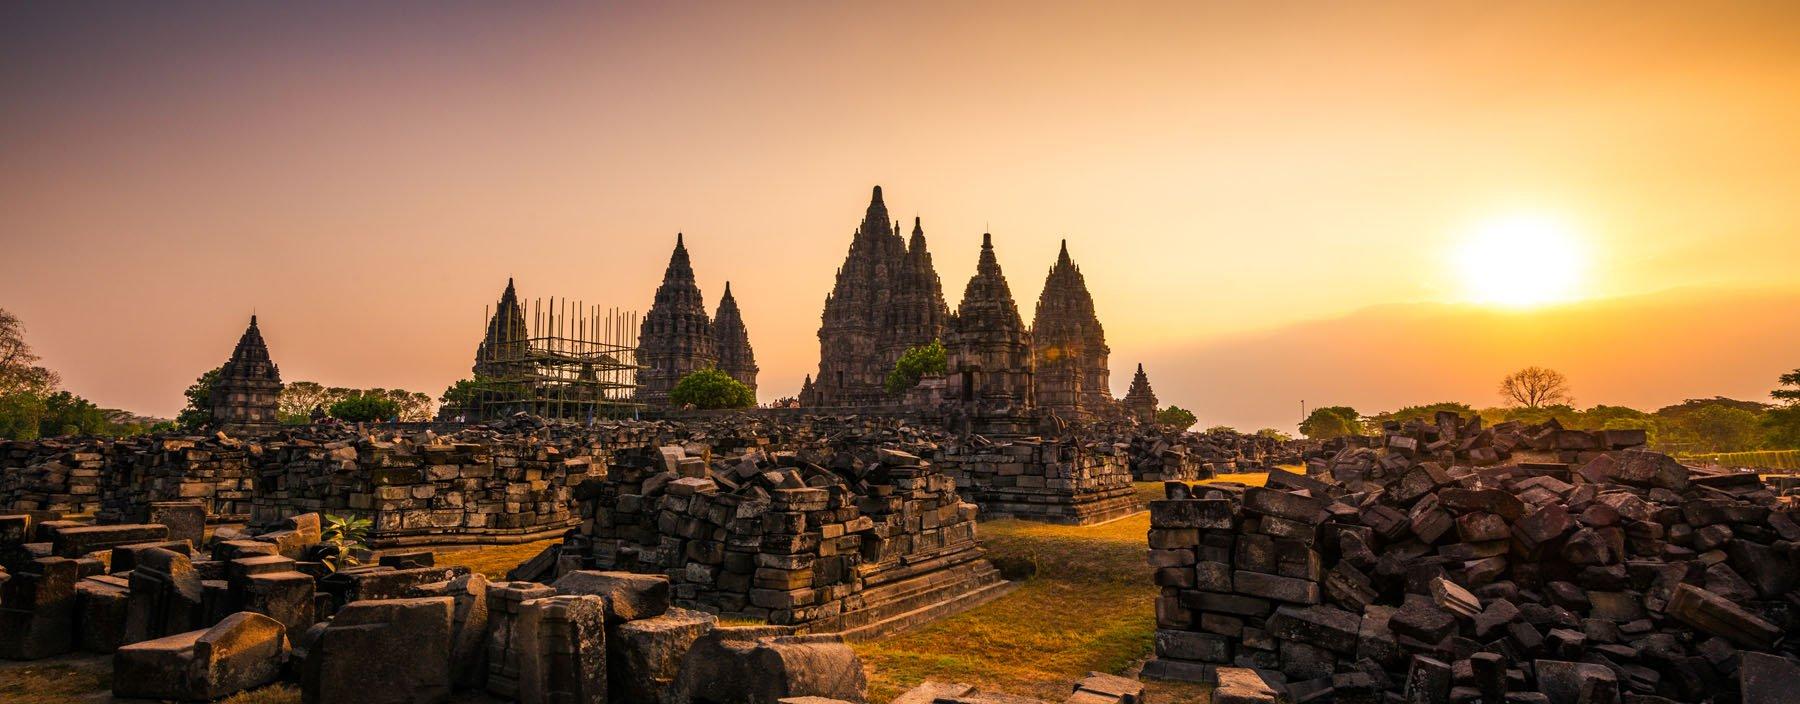 id, java, jogjakarta, prambanan temple (3).jpg